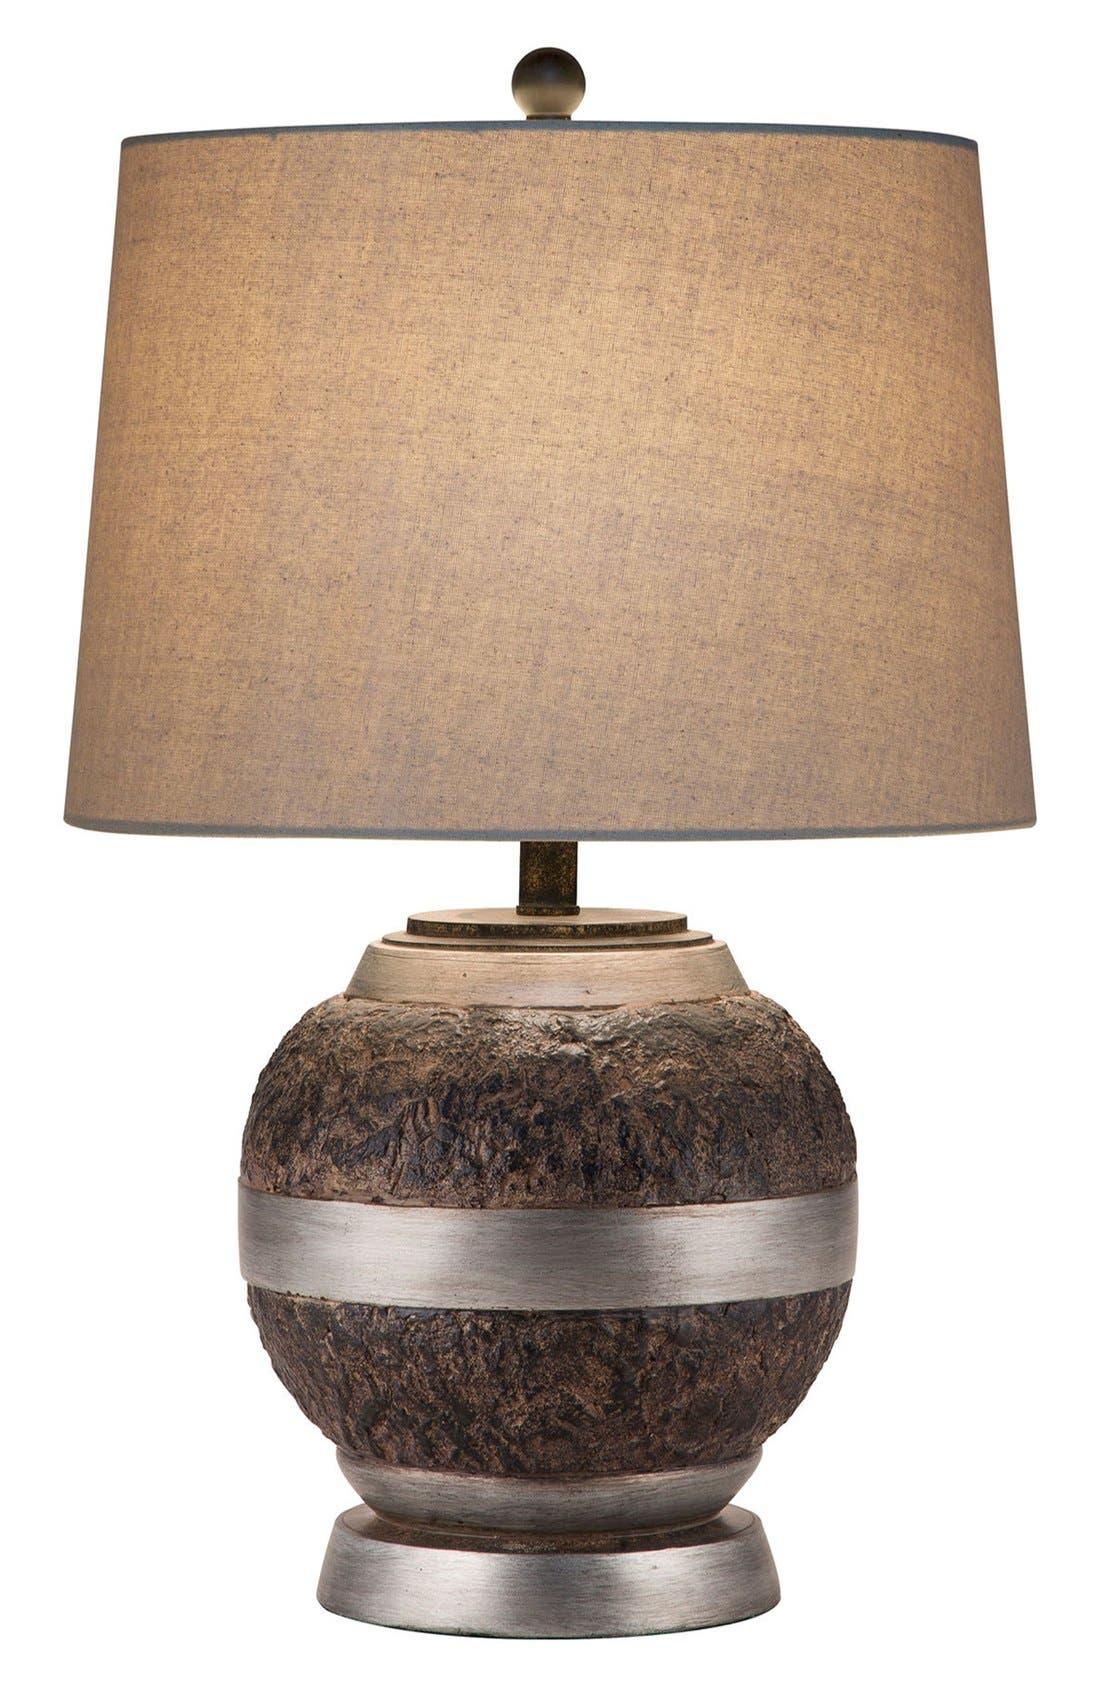 JAlexander Textured Bronze Finish Table Lamp